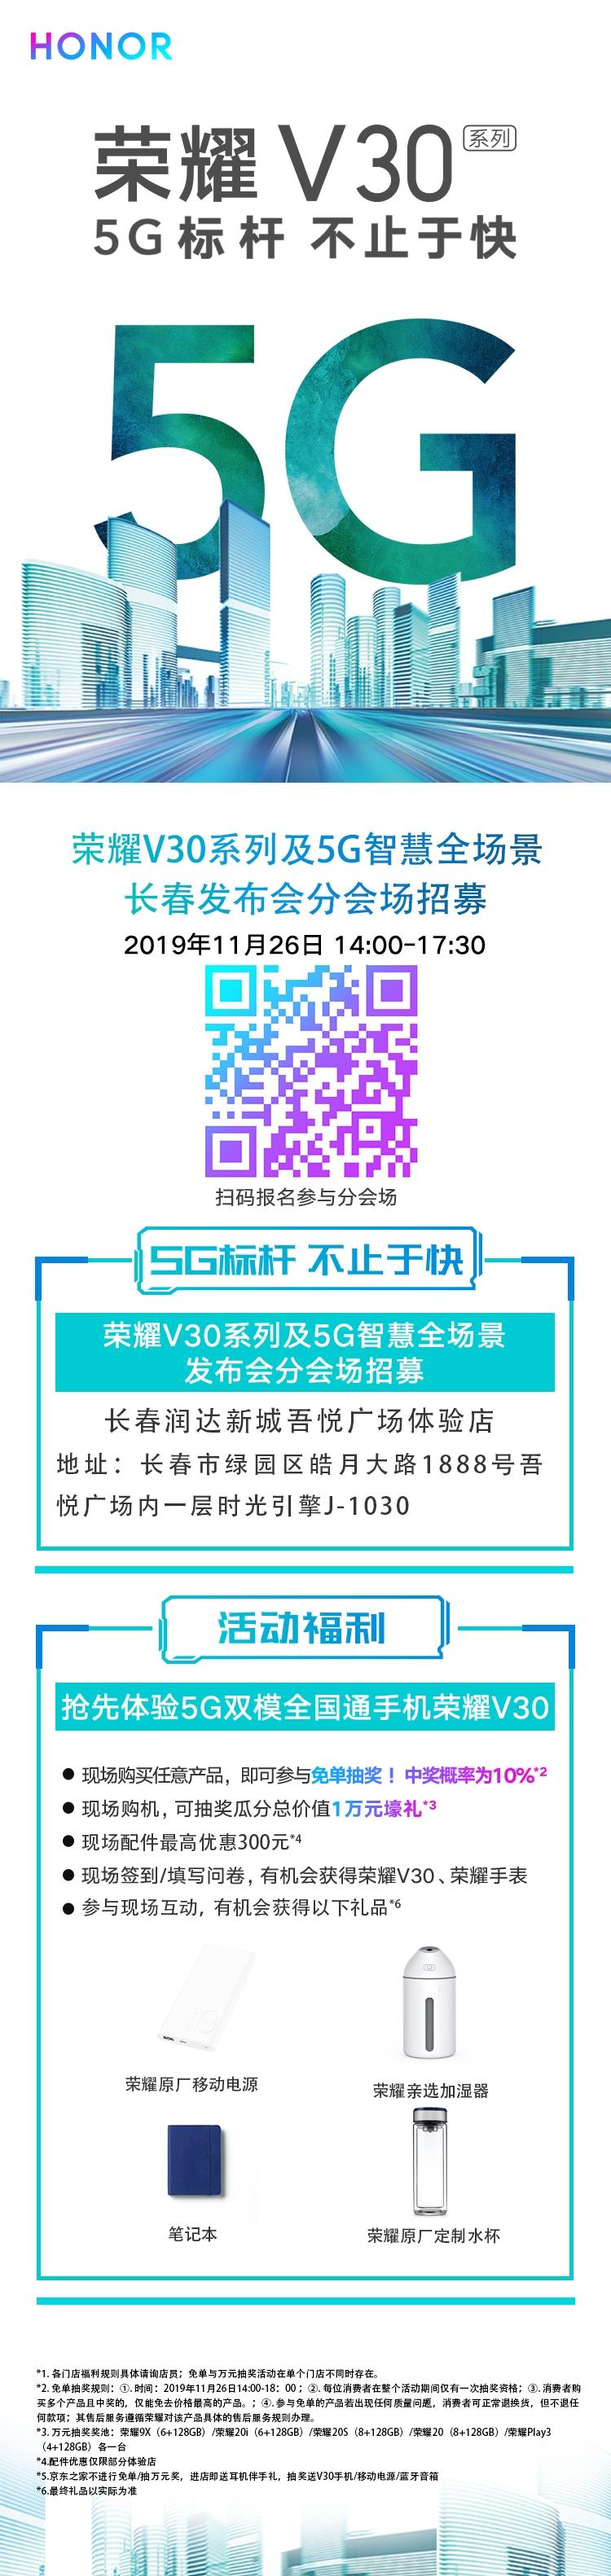 V30分会场招募长图.jpg